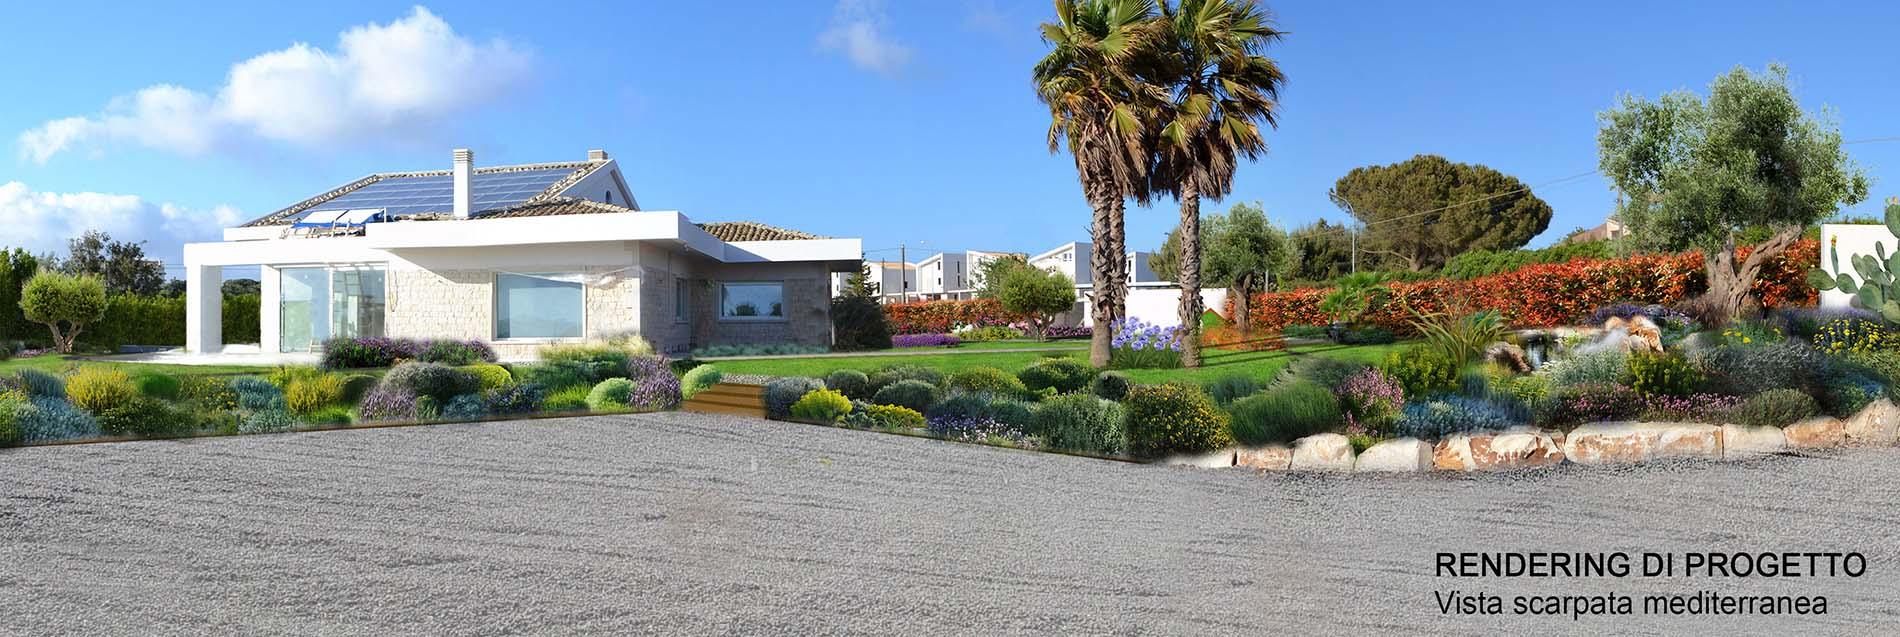 Giardino el render 02 bb architettura del paesaggio for Rendering giardino